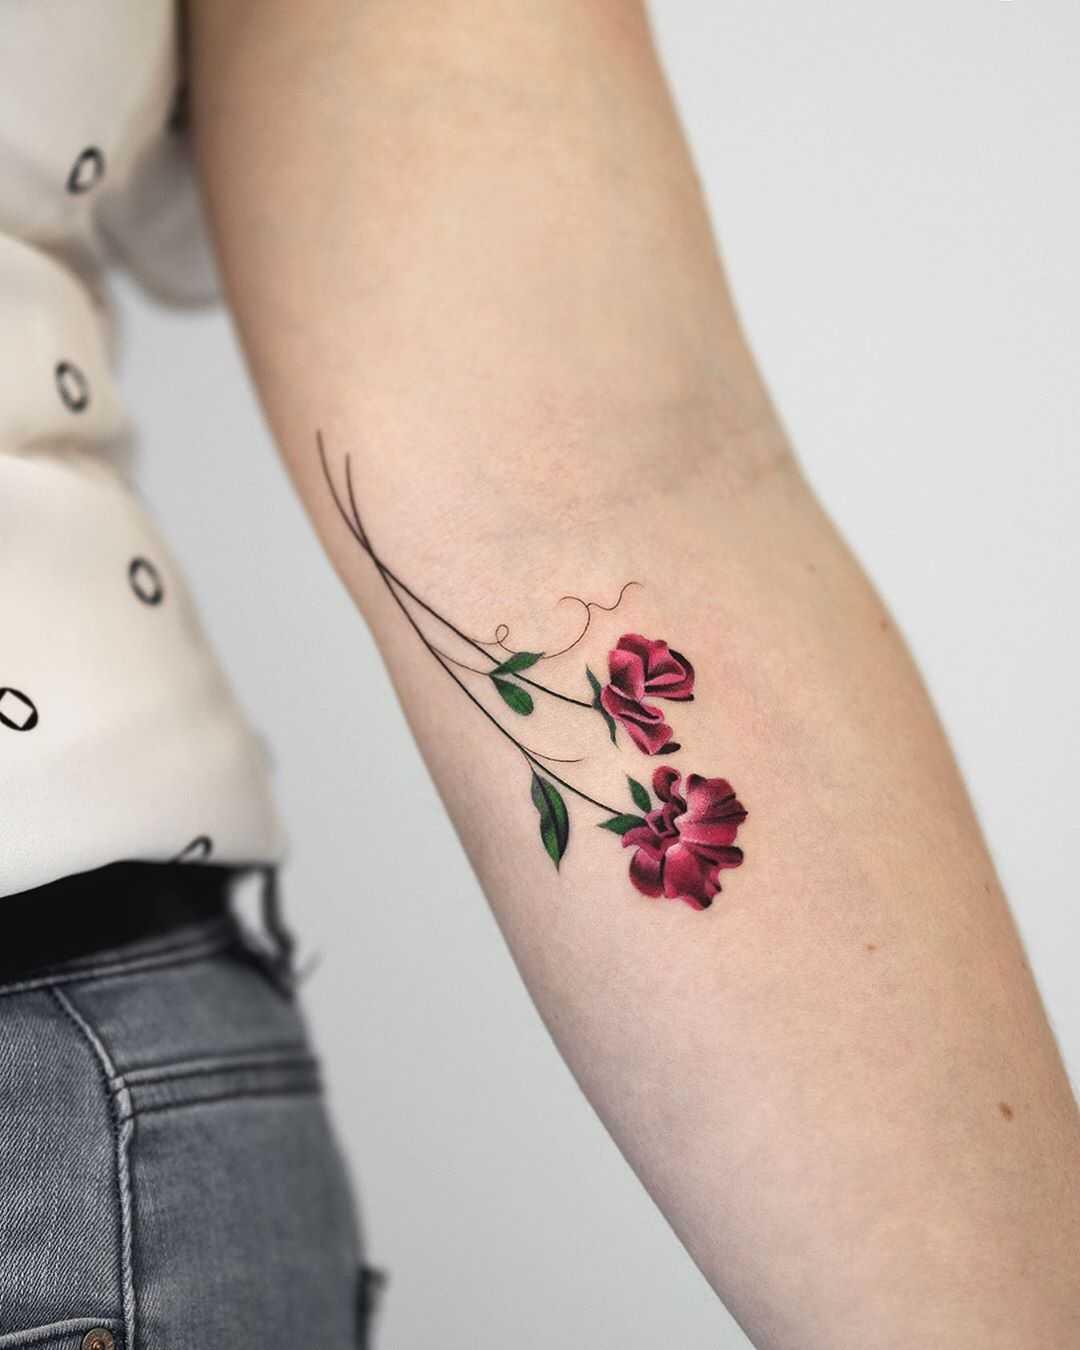 Pea flowers tattoo by Rey Jasper